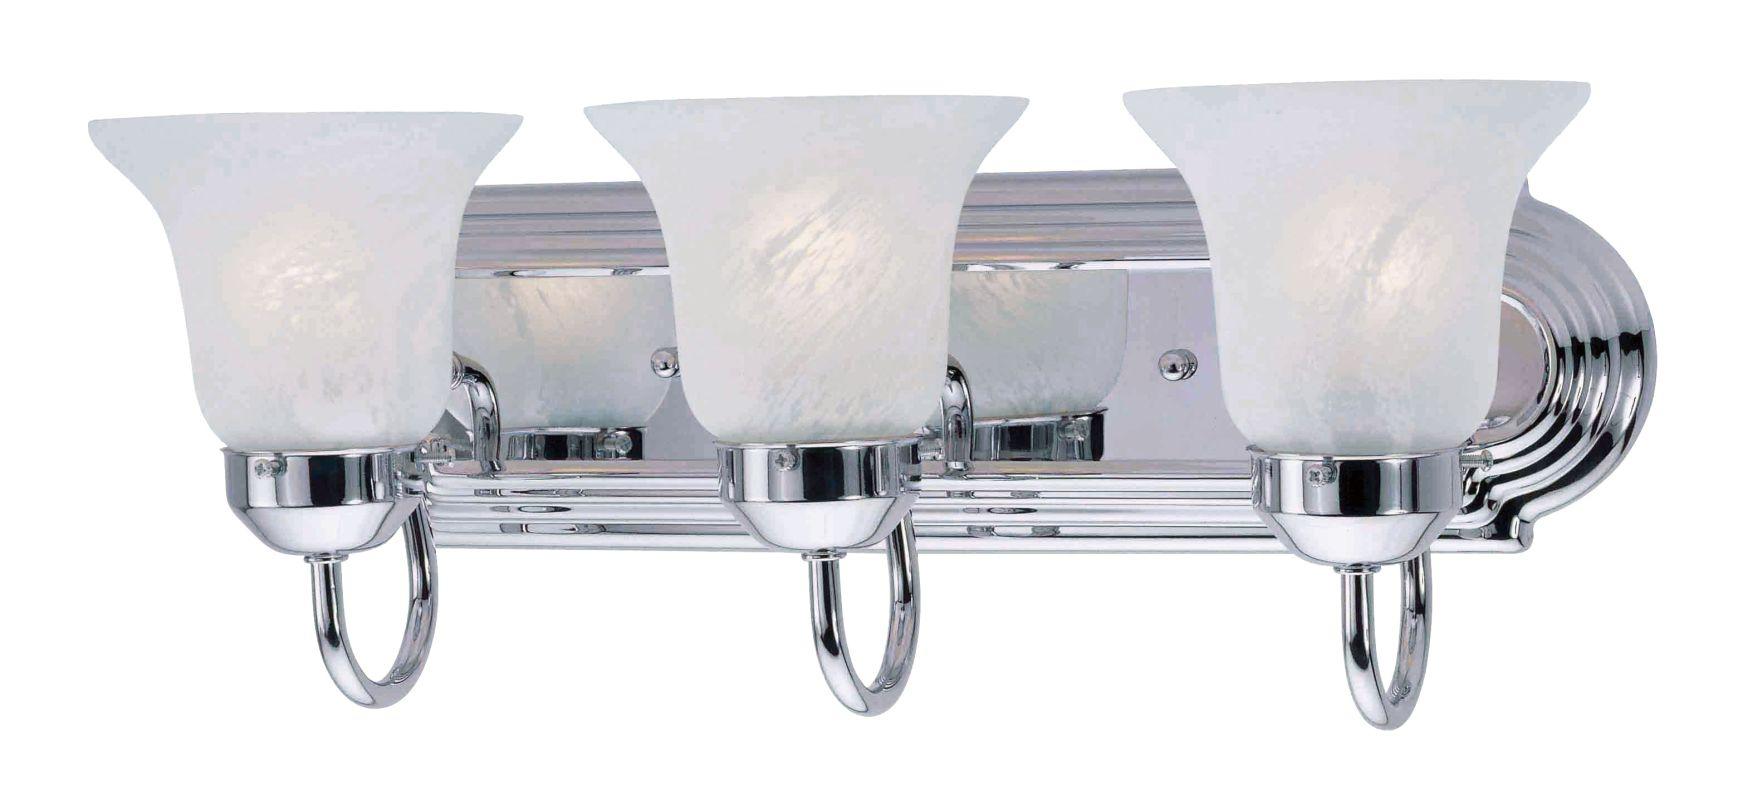 Livex Lighting 1073P Riviera 3 Light Bathroom Vanity Light Chrome